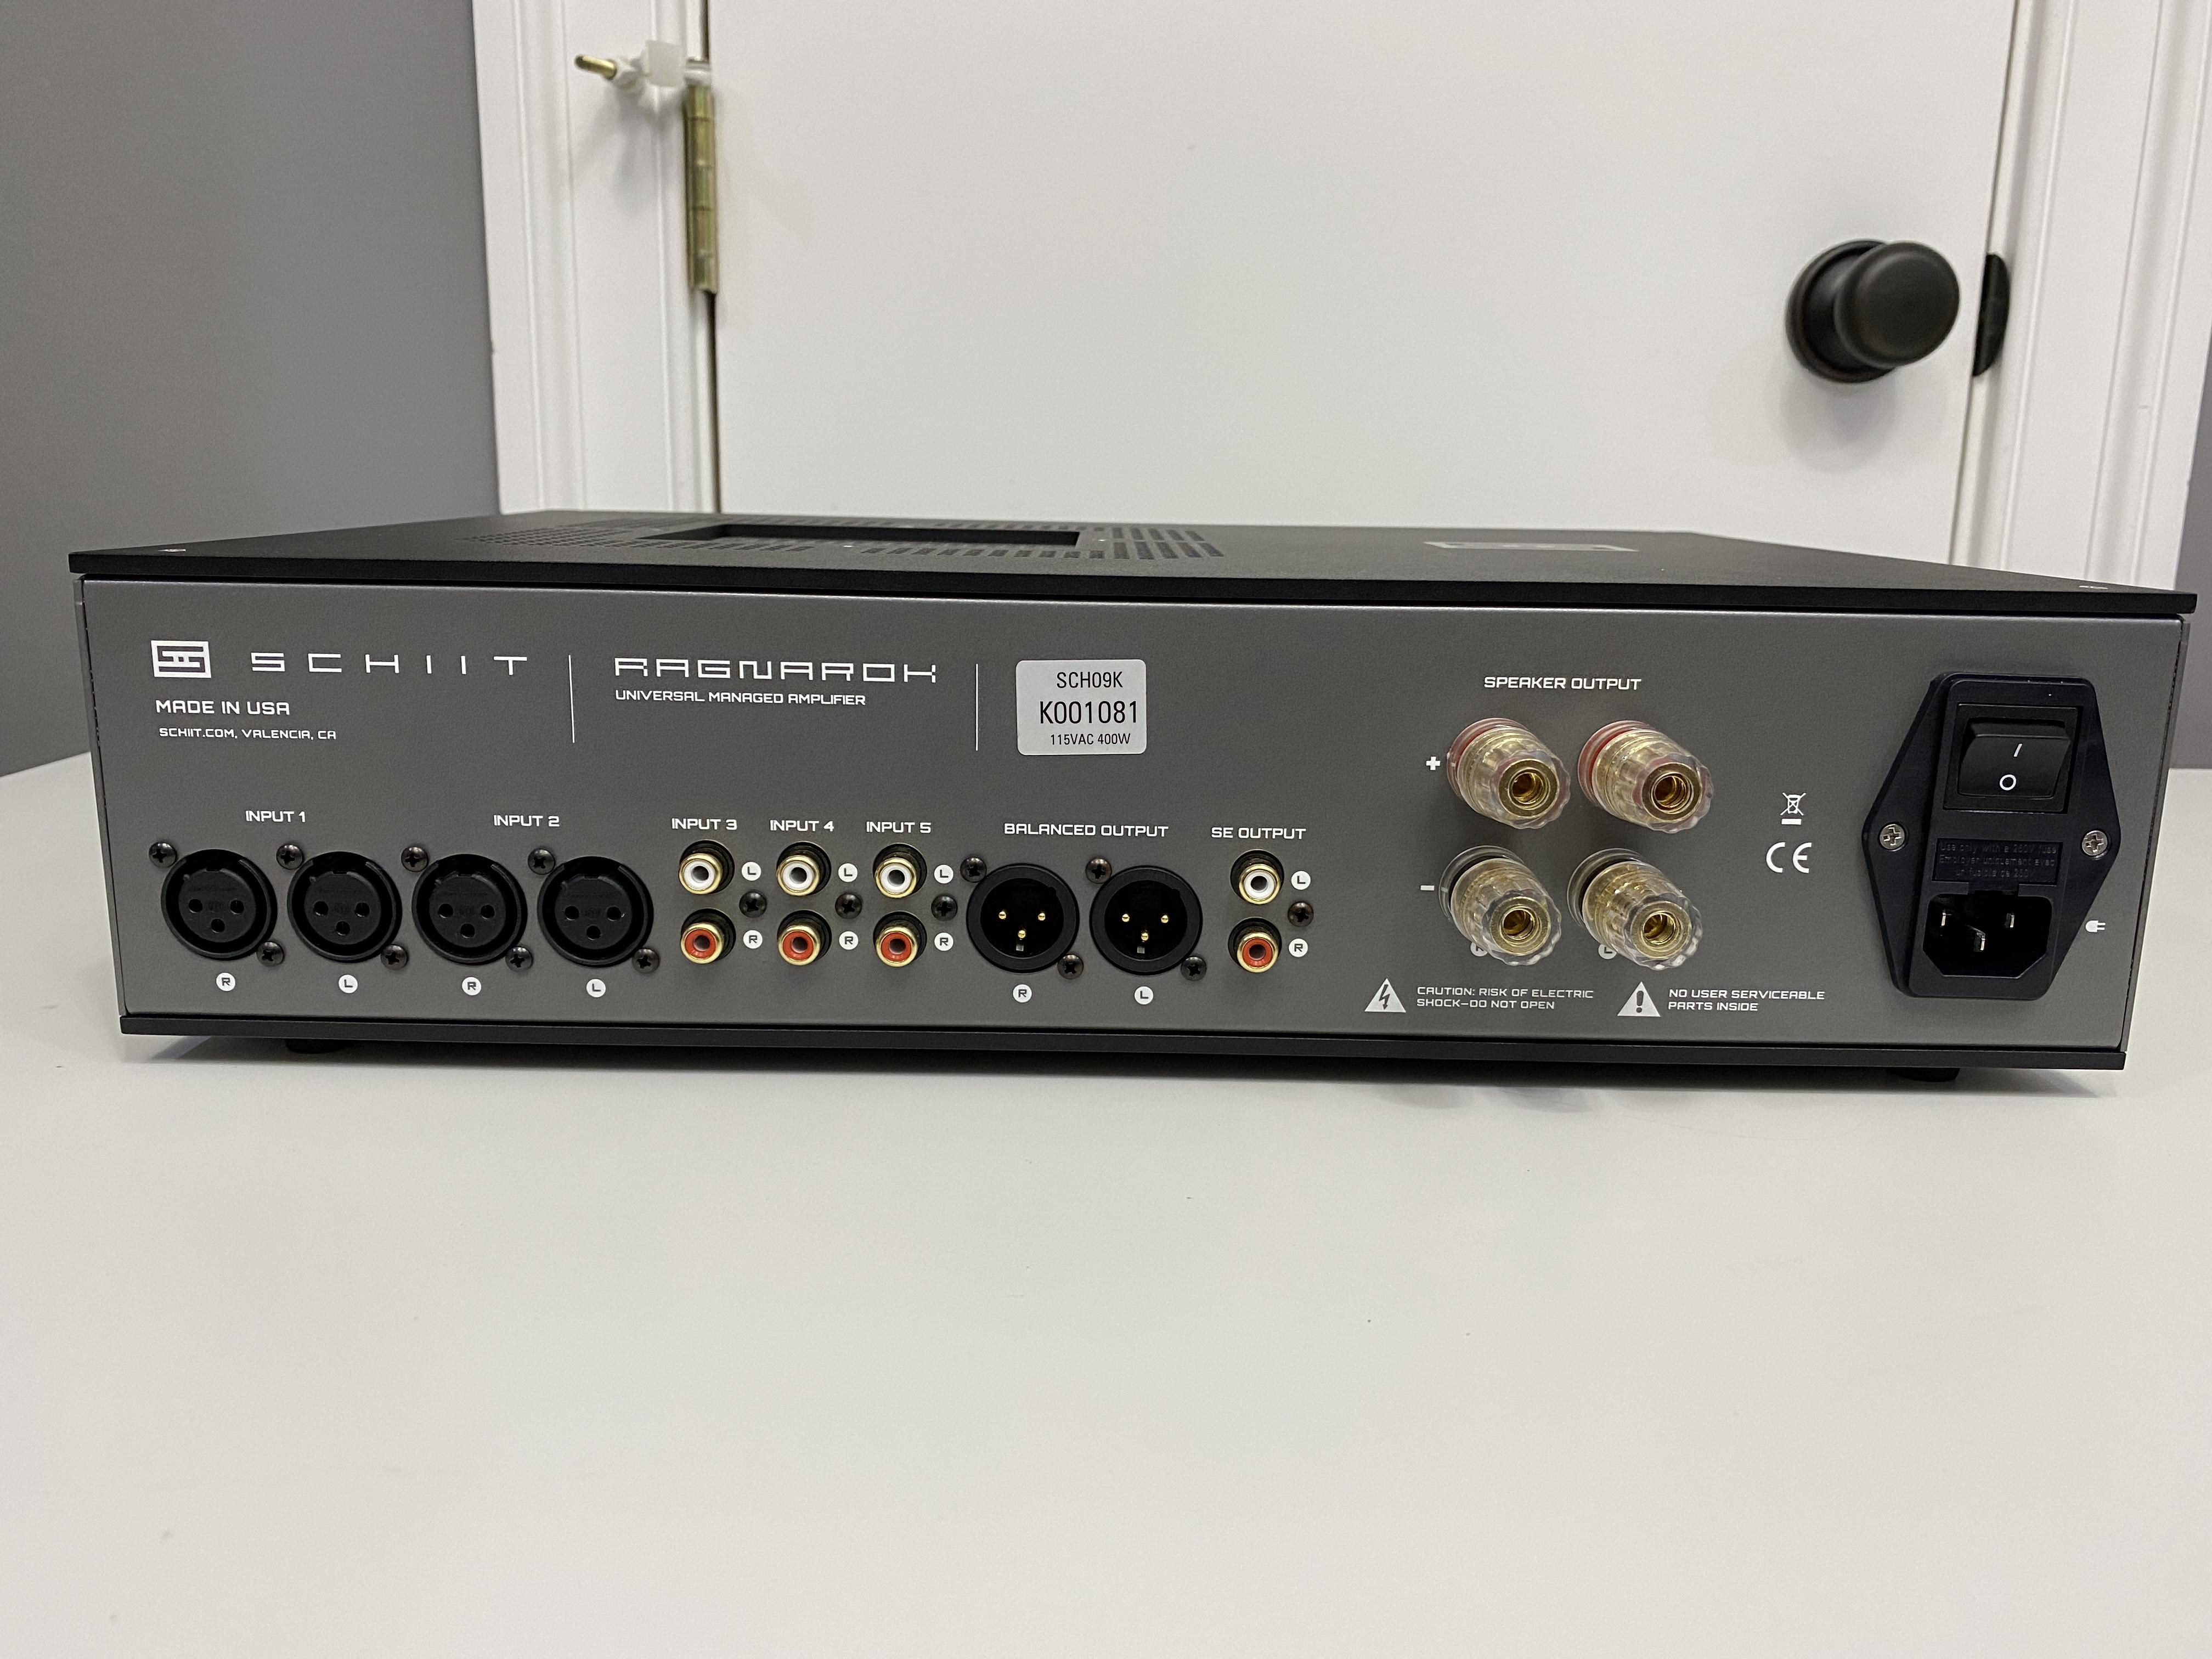 6C6B4451-EF71-465B-8891-69D95286BDBE.jpeg